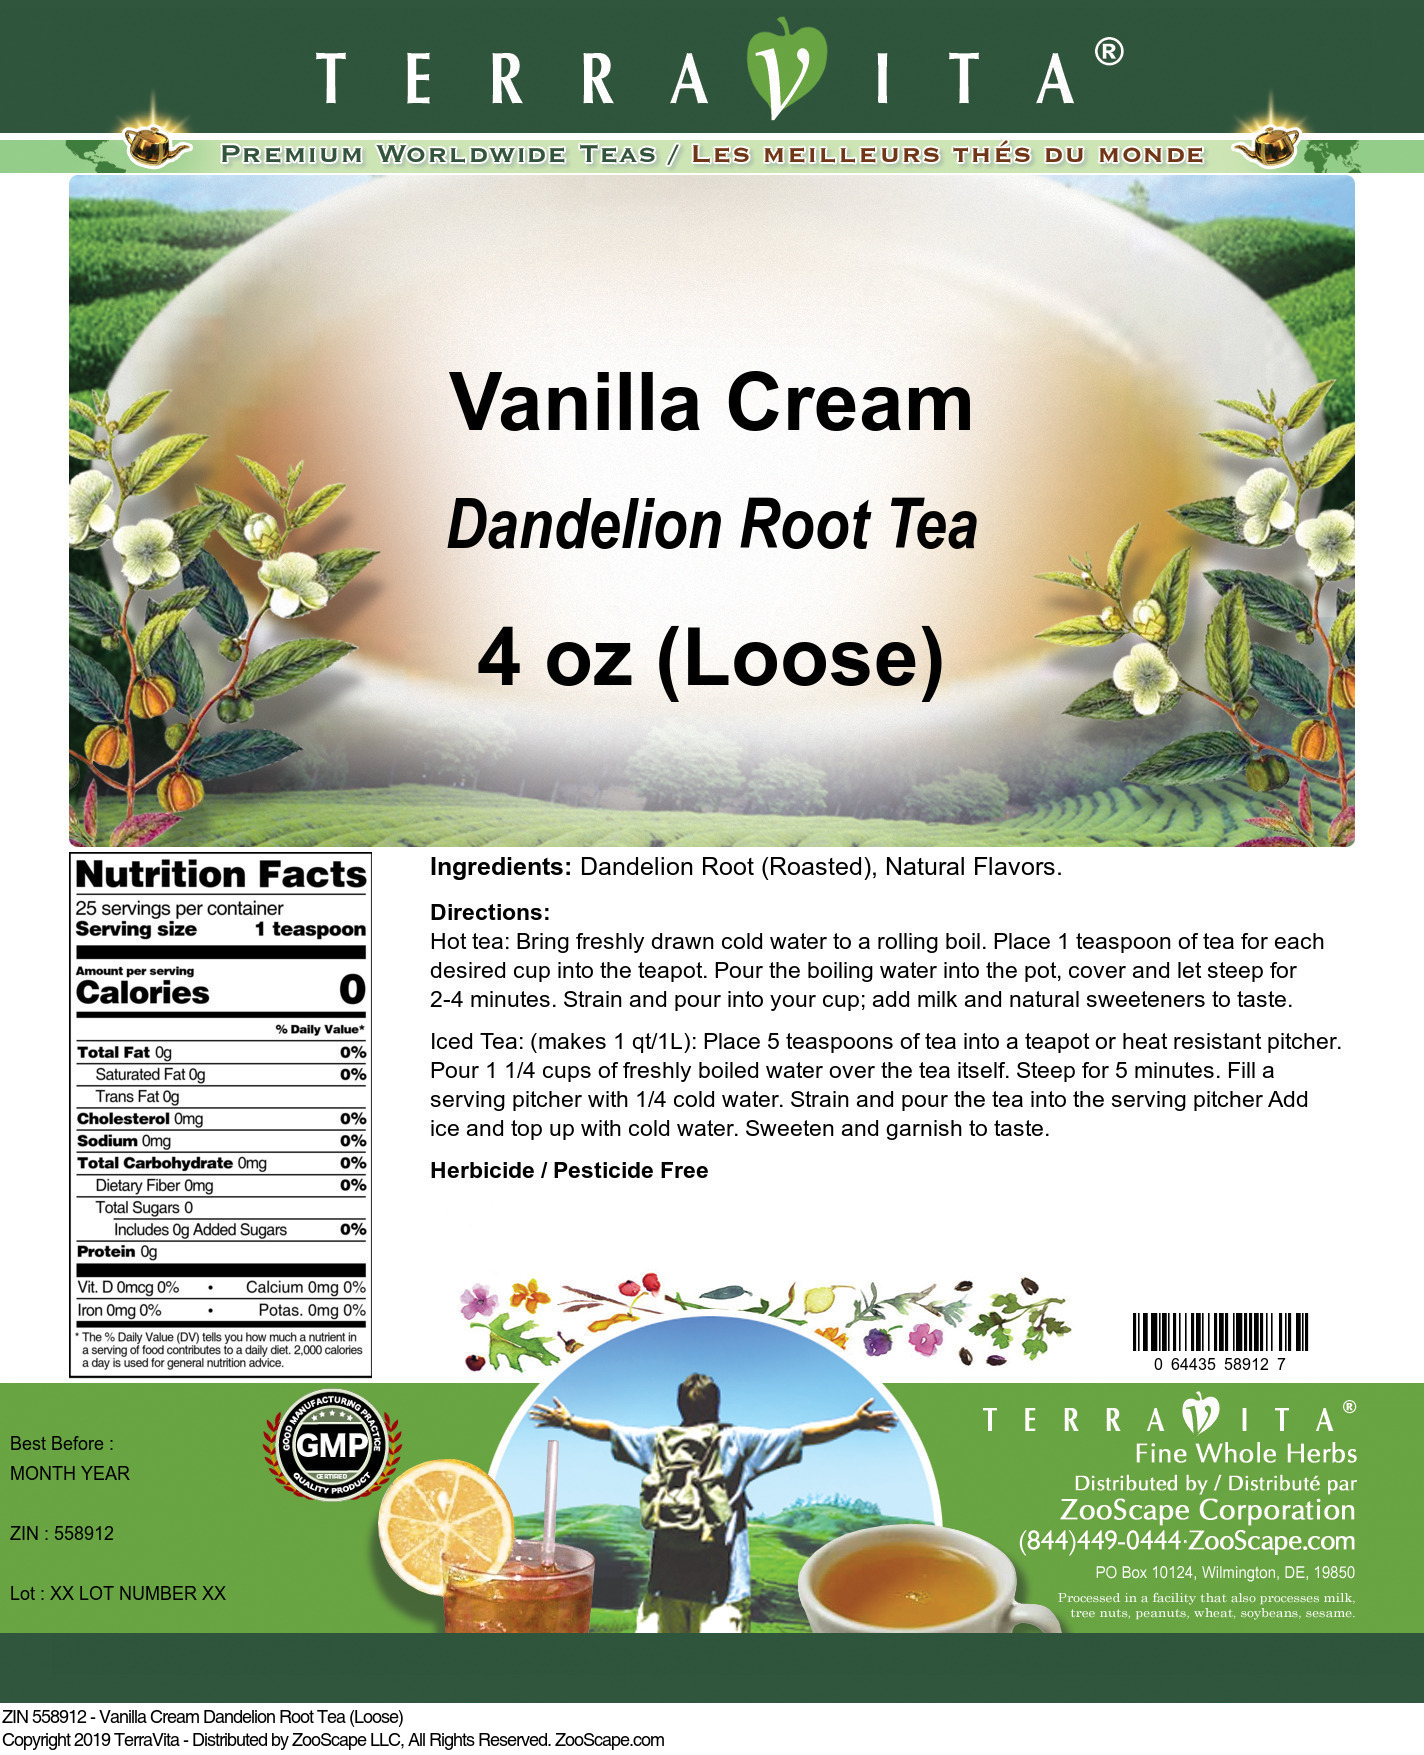 Vanilla Cream Dandelion Root Tea (Loose)